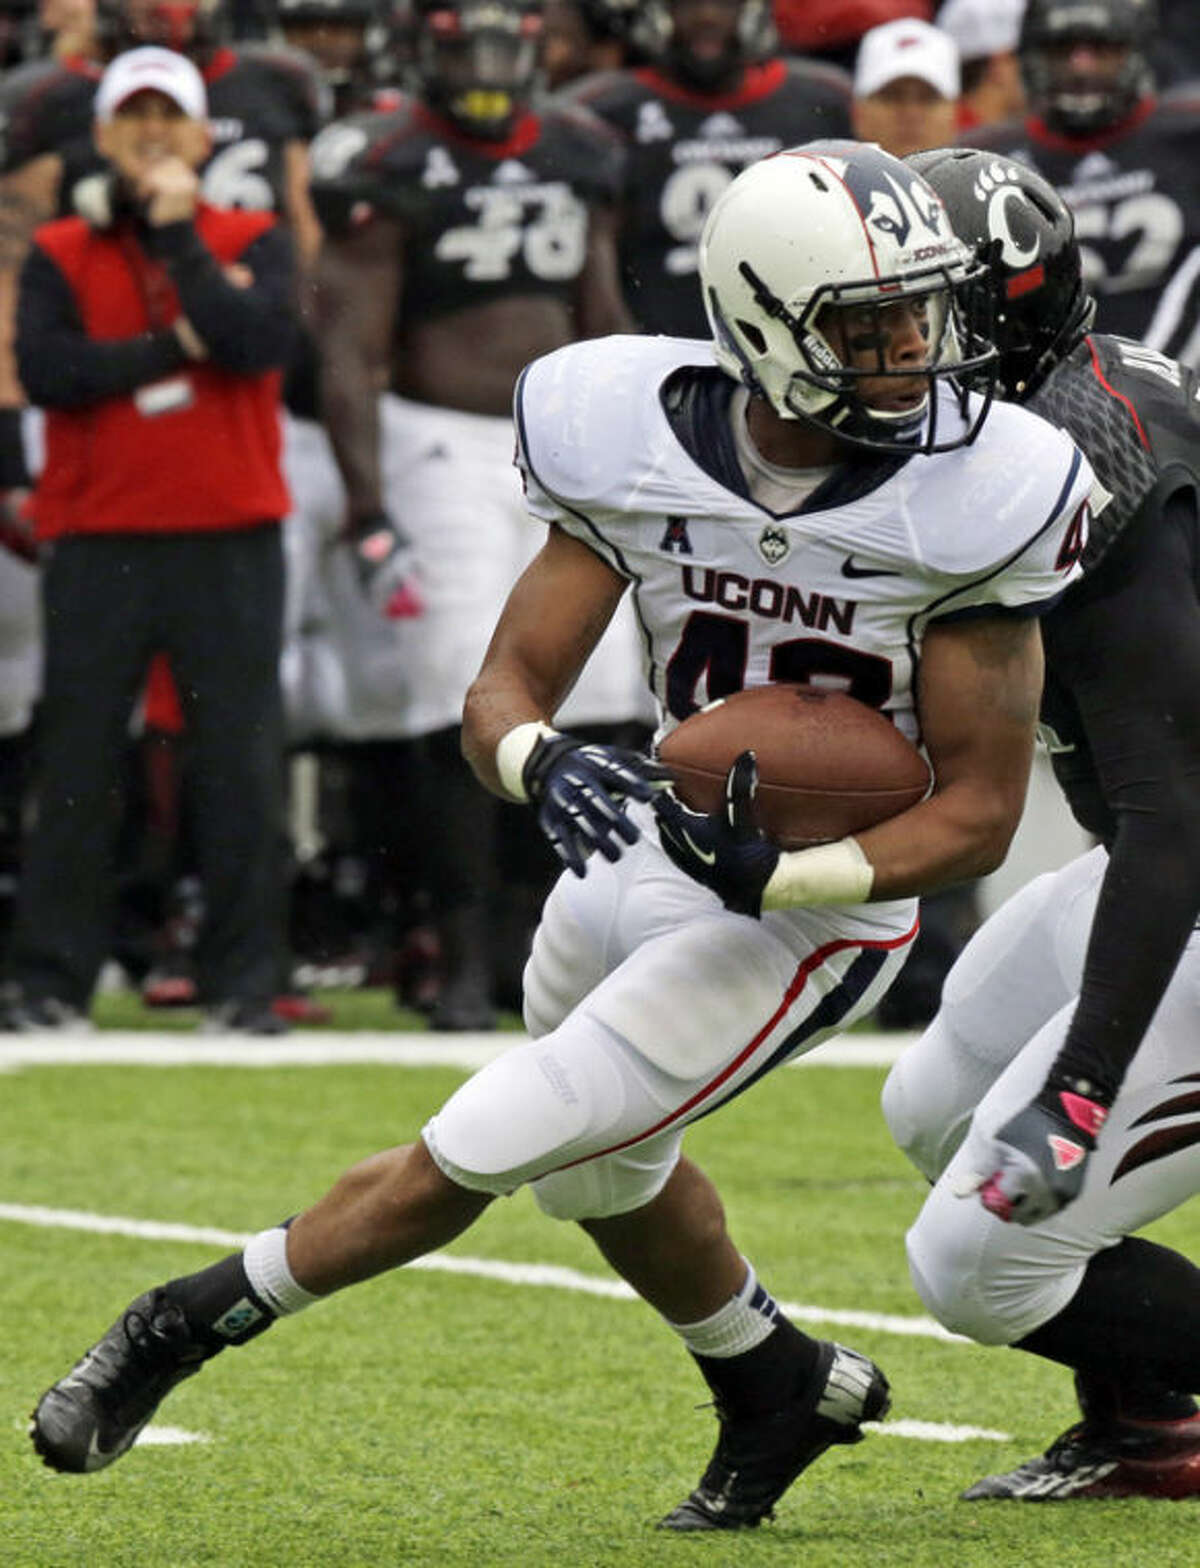 Connecticut running back Lyle McCombs (43) is pursued by Cincinnati linebacker Greg Blair in the first half of an NCAA college football game, Saturday, Oct. 19, 2013, in Cincinnati. (AP Photo/Al Behrman)